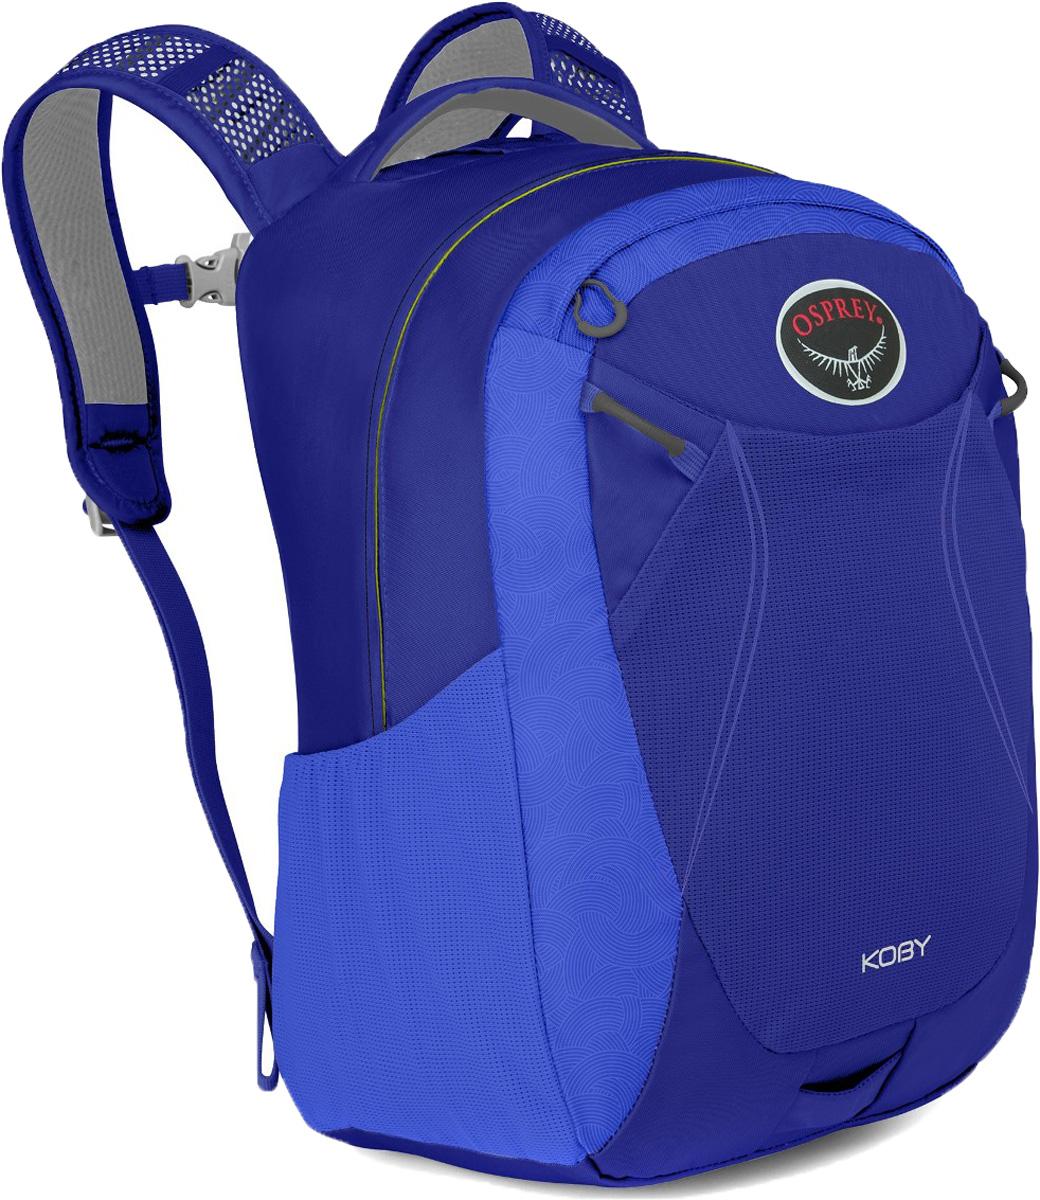 купить Рюкзак Osprey Koby 20, цвет: синий, 20 л недорого